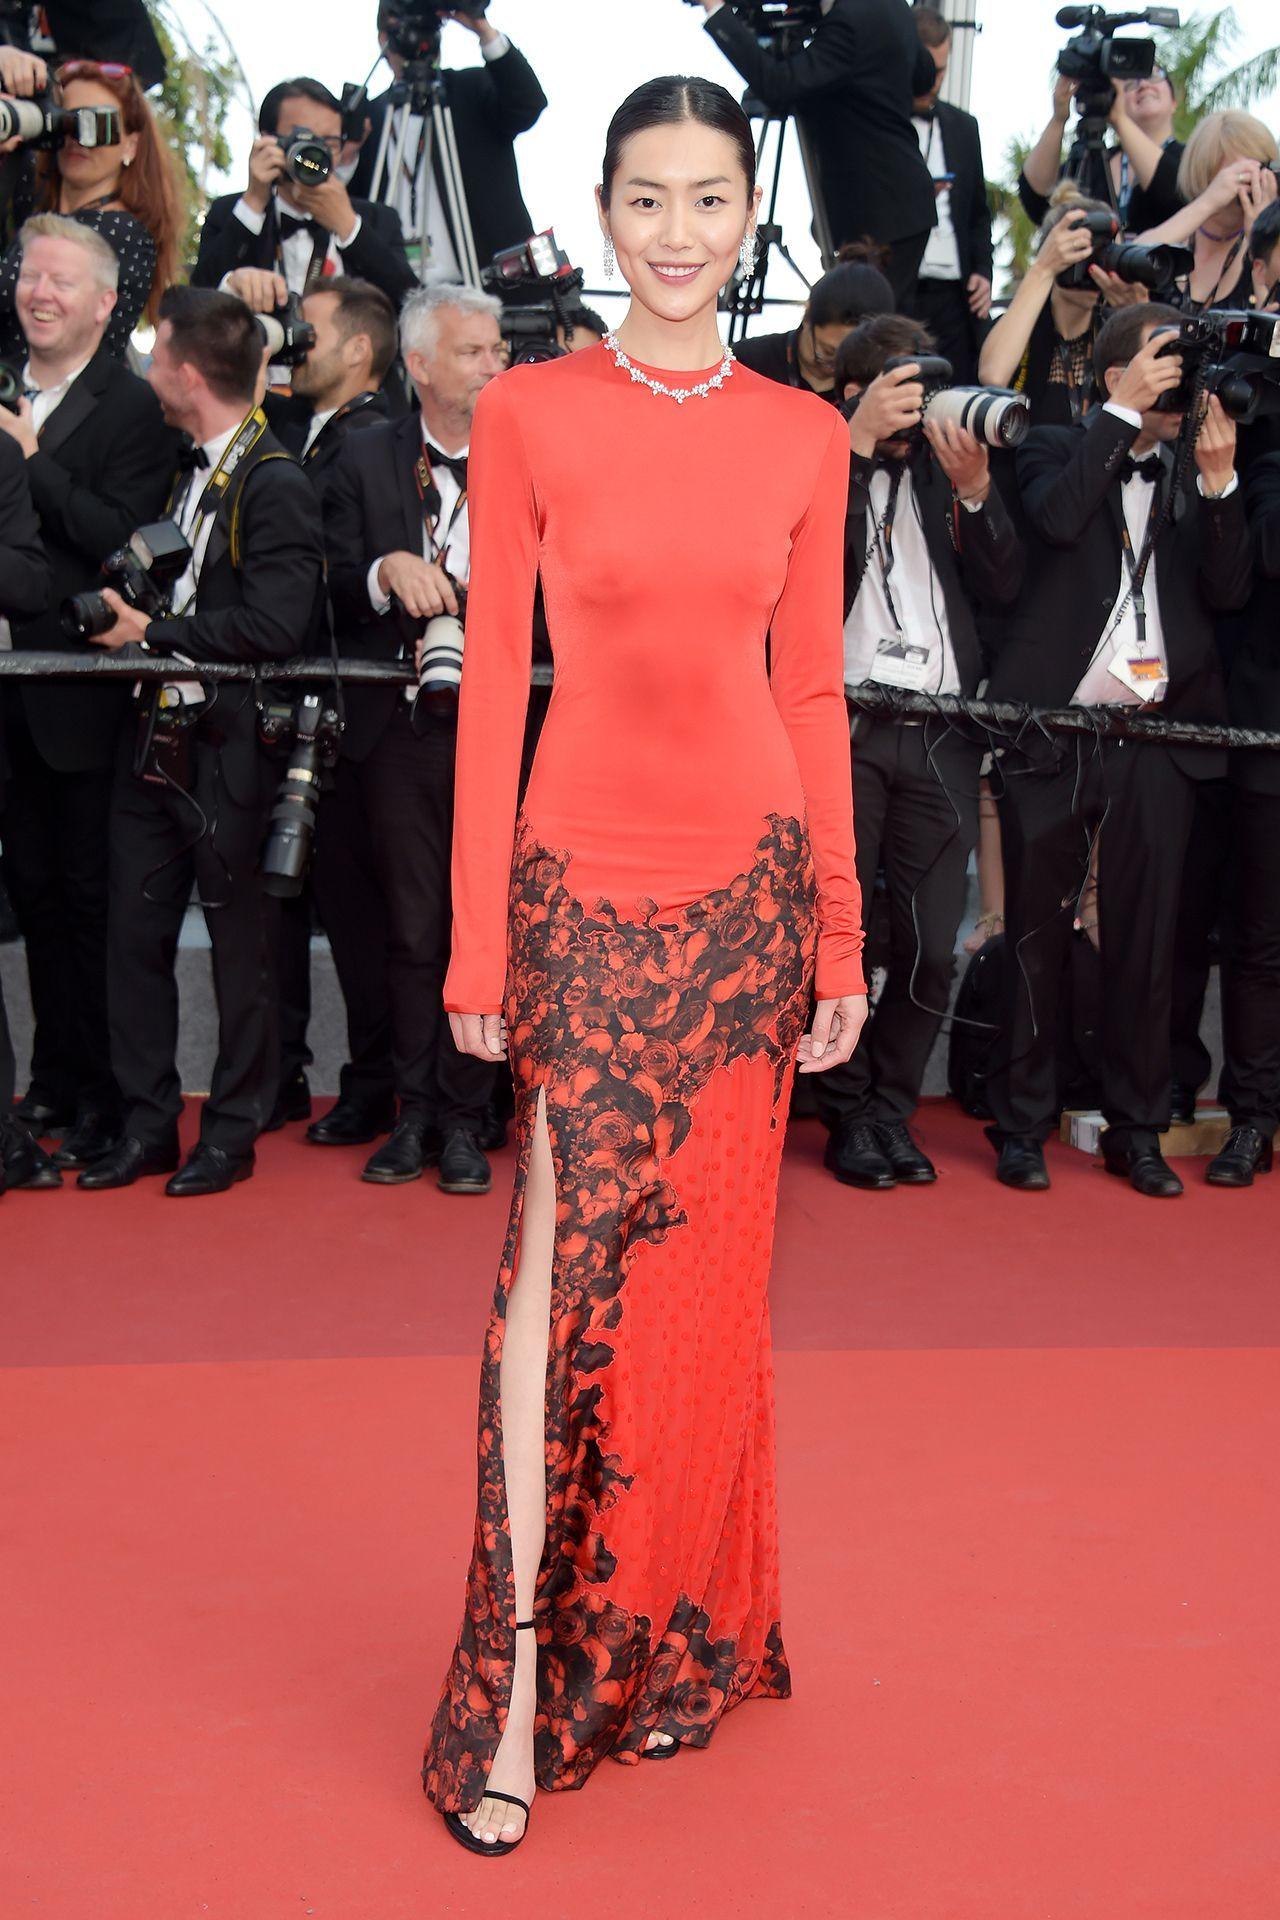 Cannes Film Festival 2017 Cannes film festival, Red